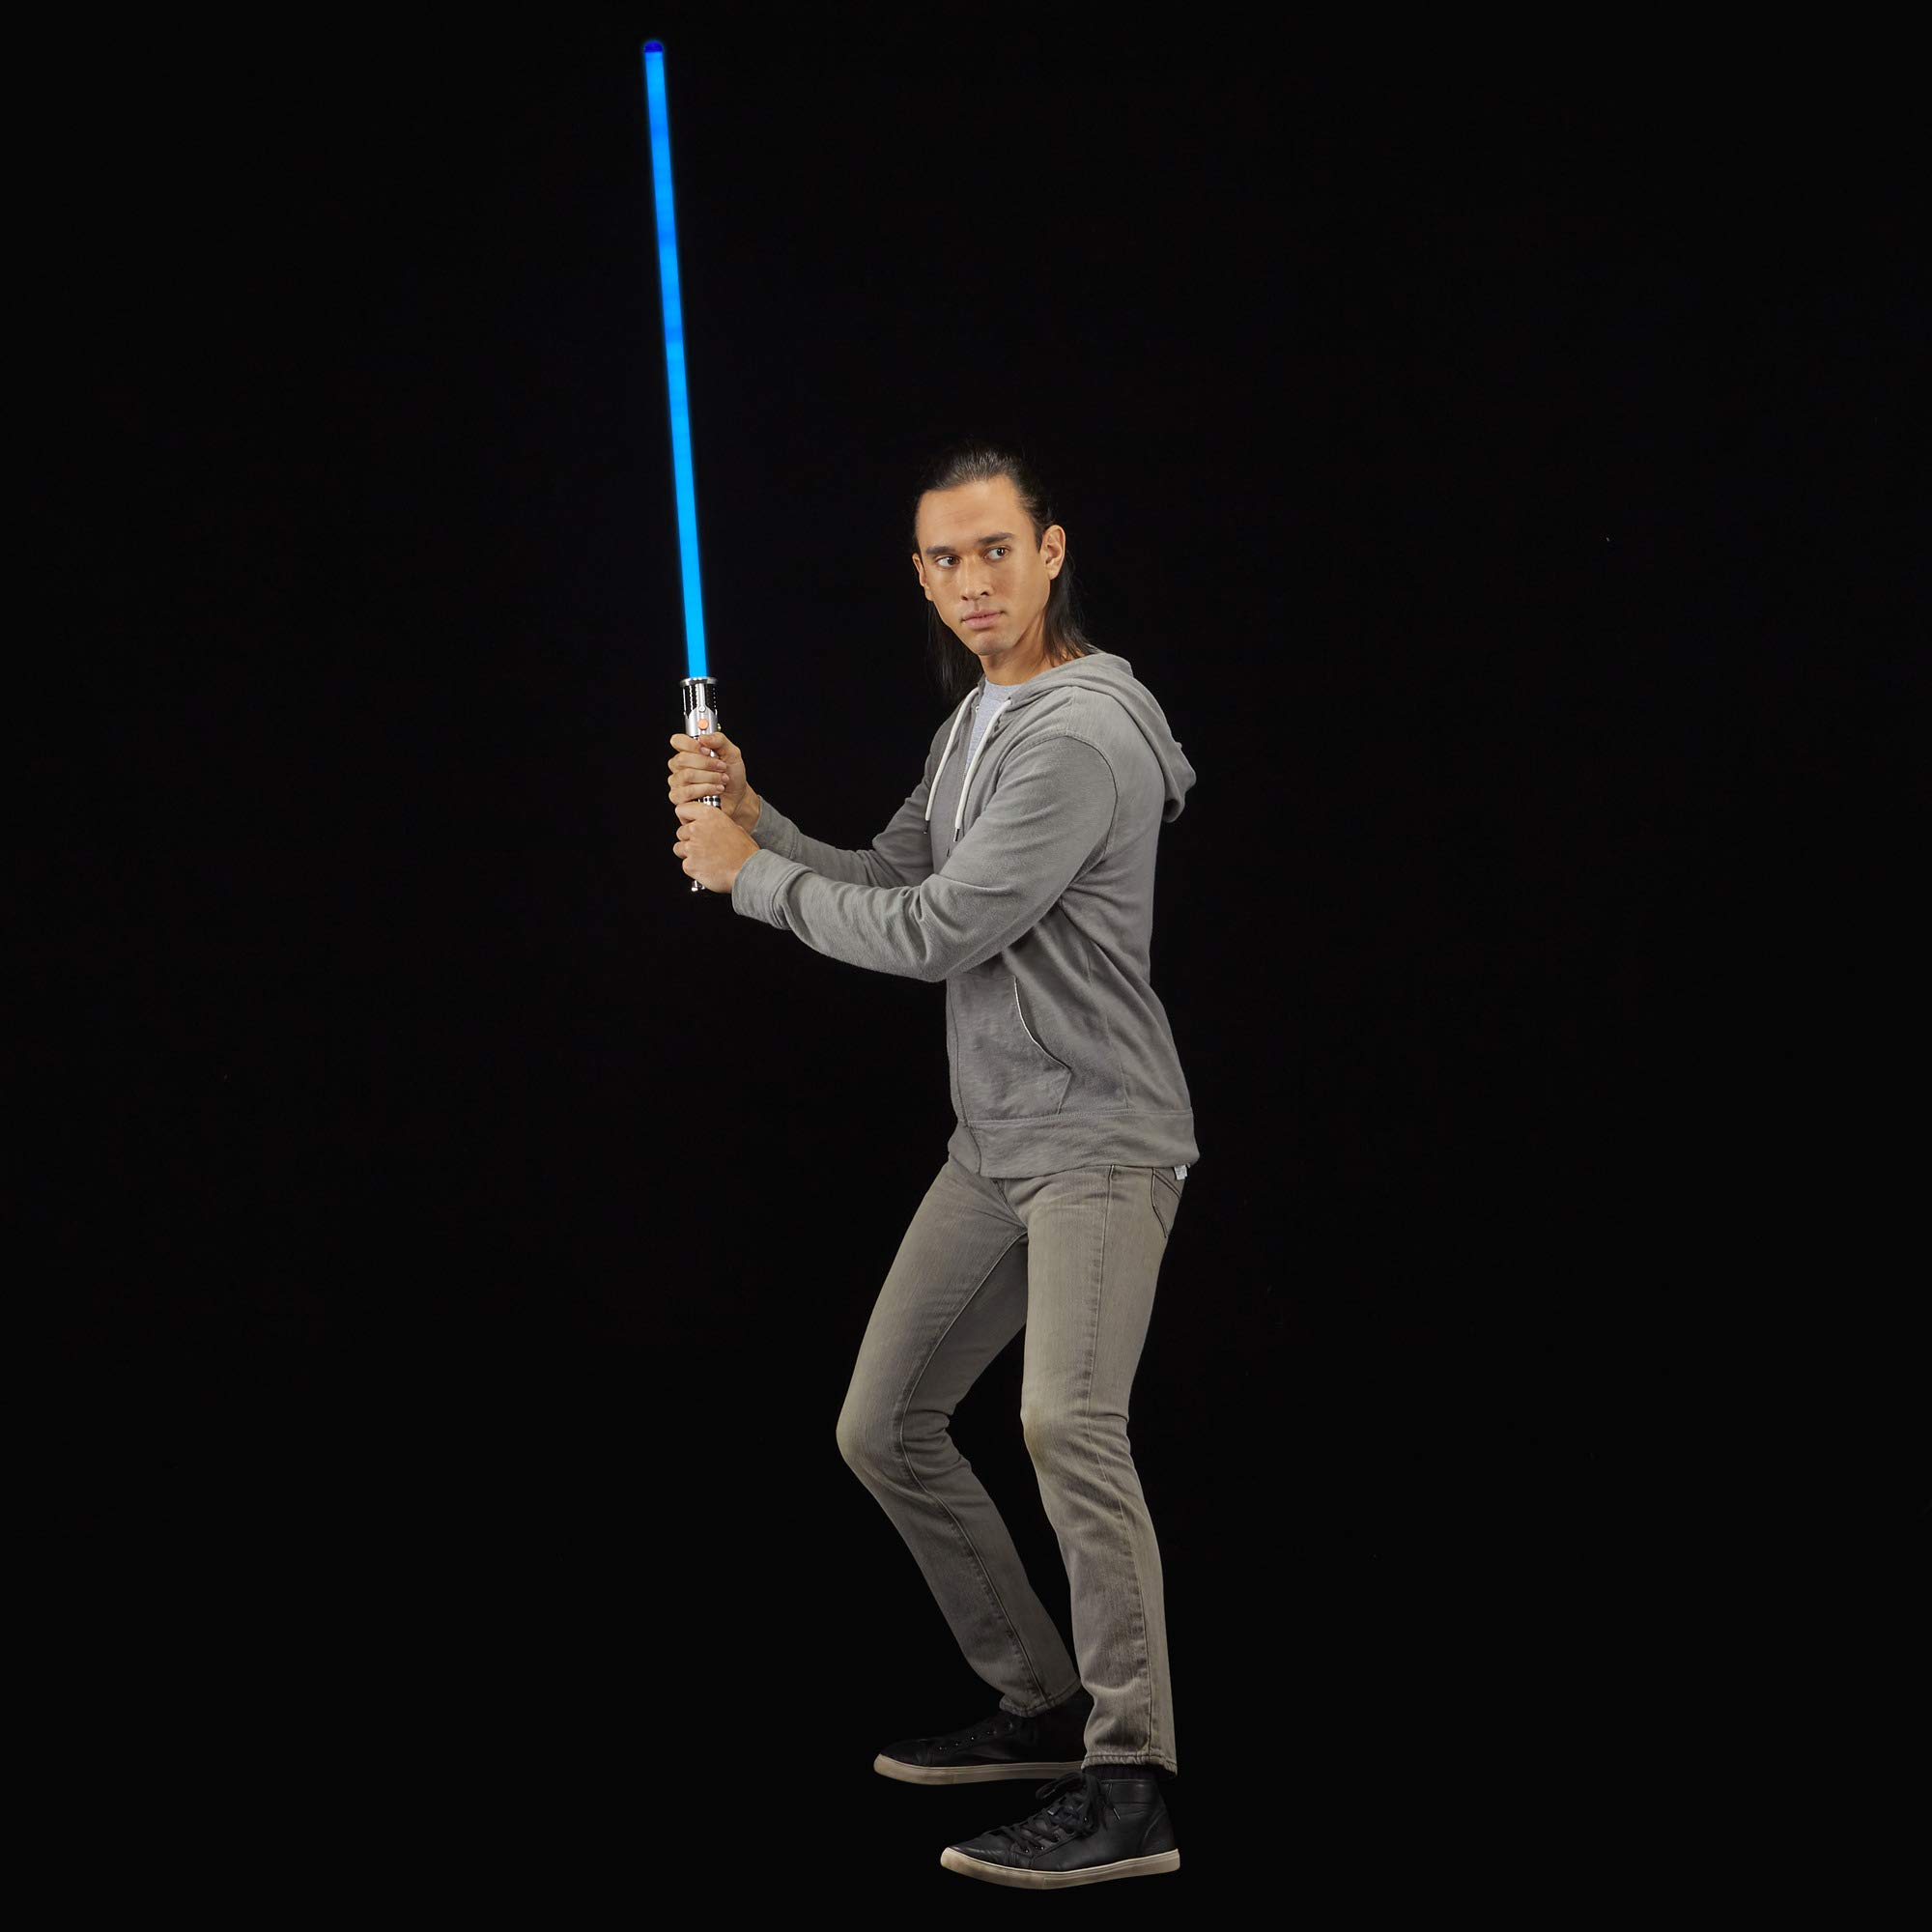 Star Wars E4890 The Black Series OBI-Wan Kenobi Ep1 Force Fx Lightsaber by Star Wars (Image #4)